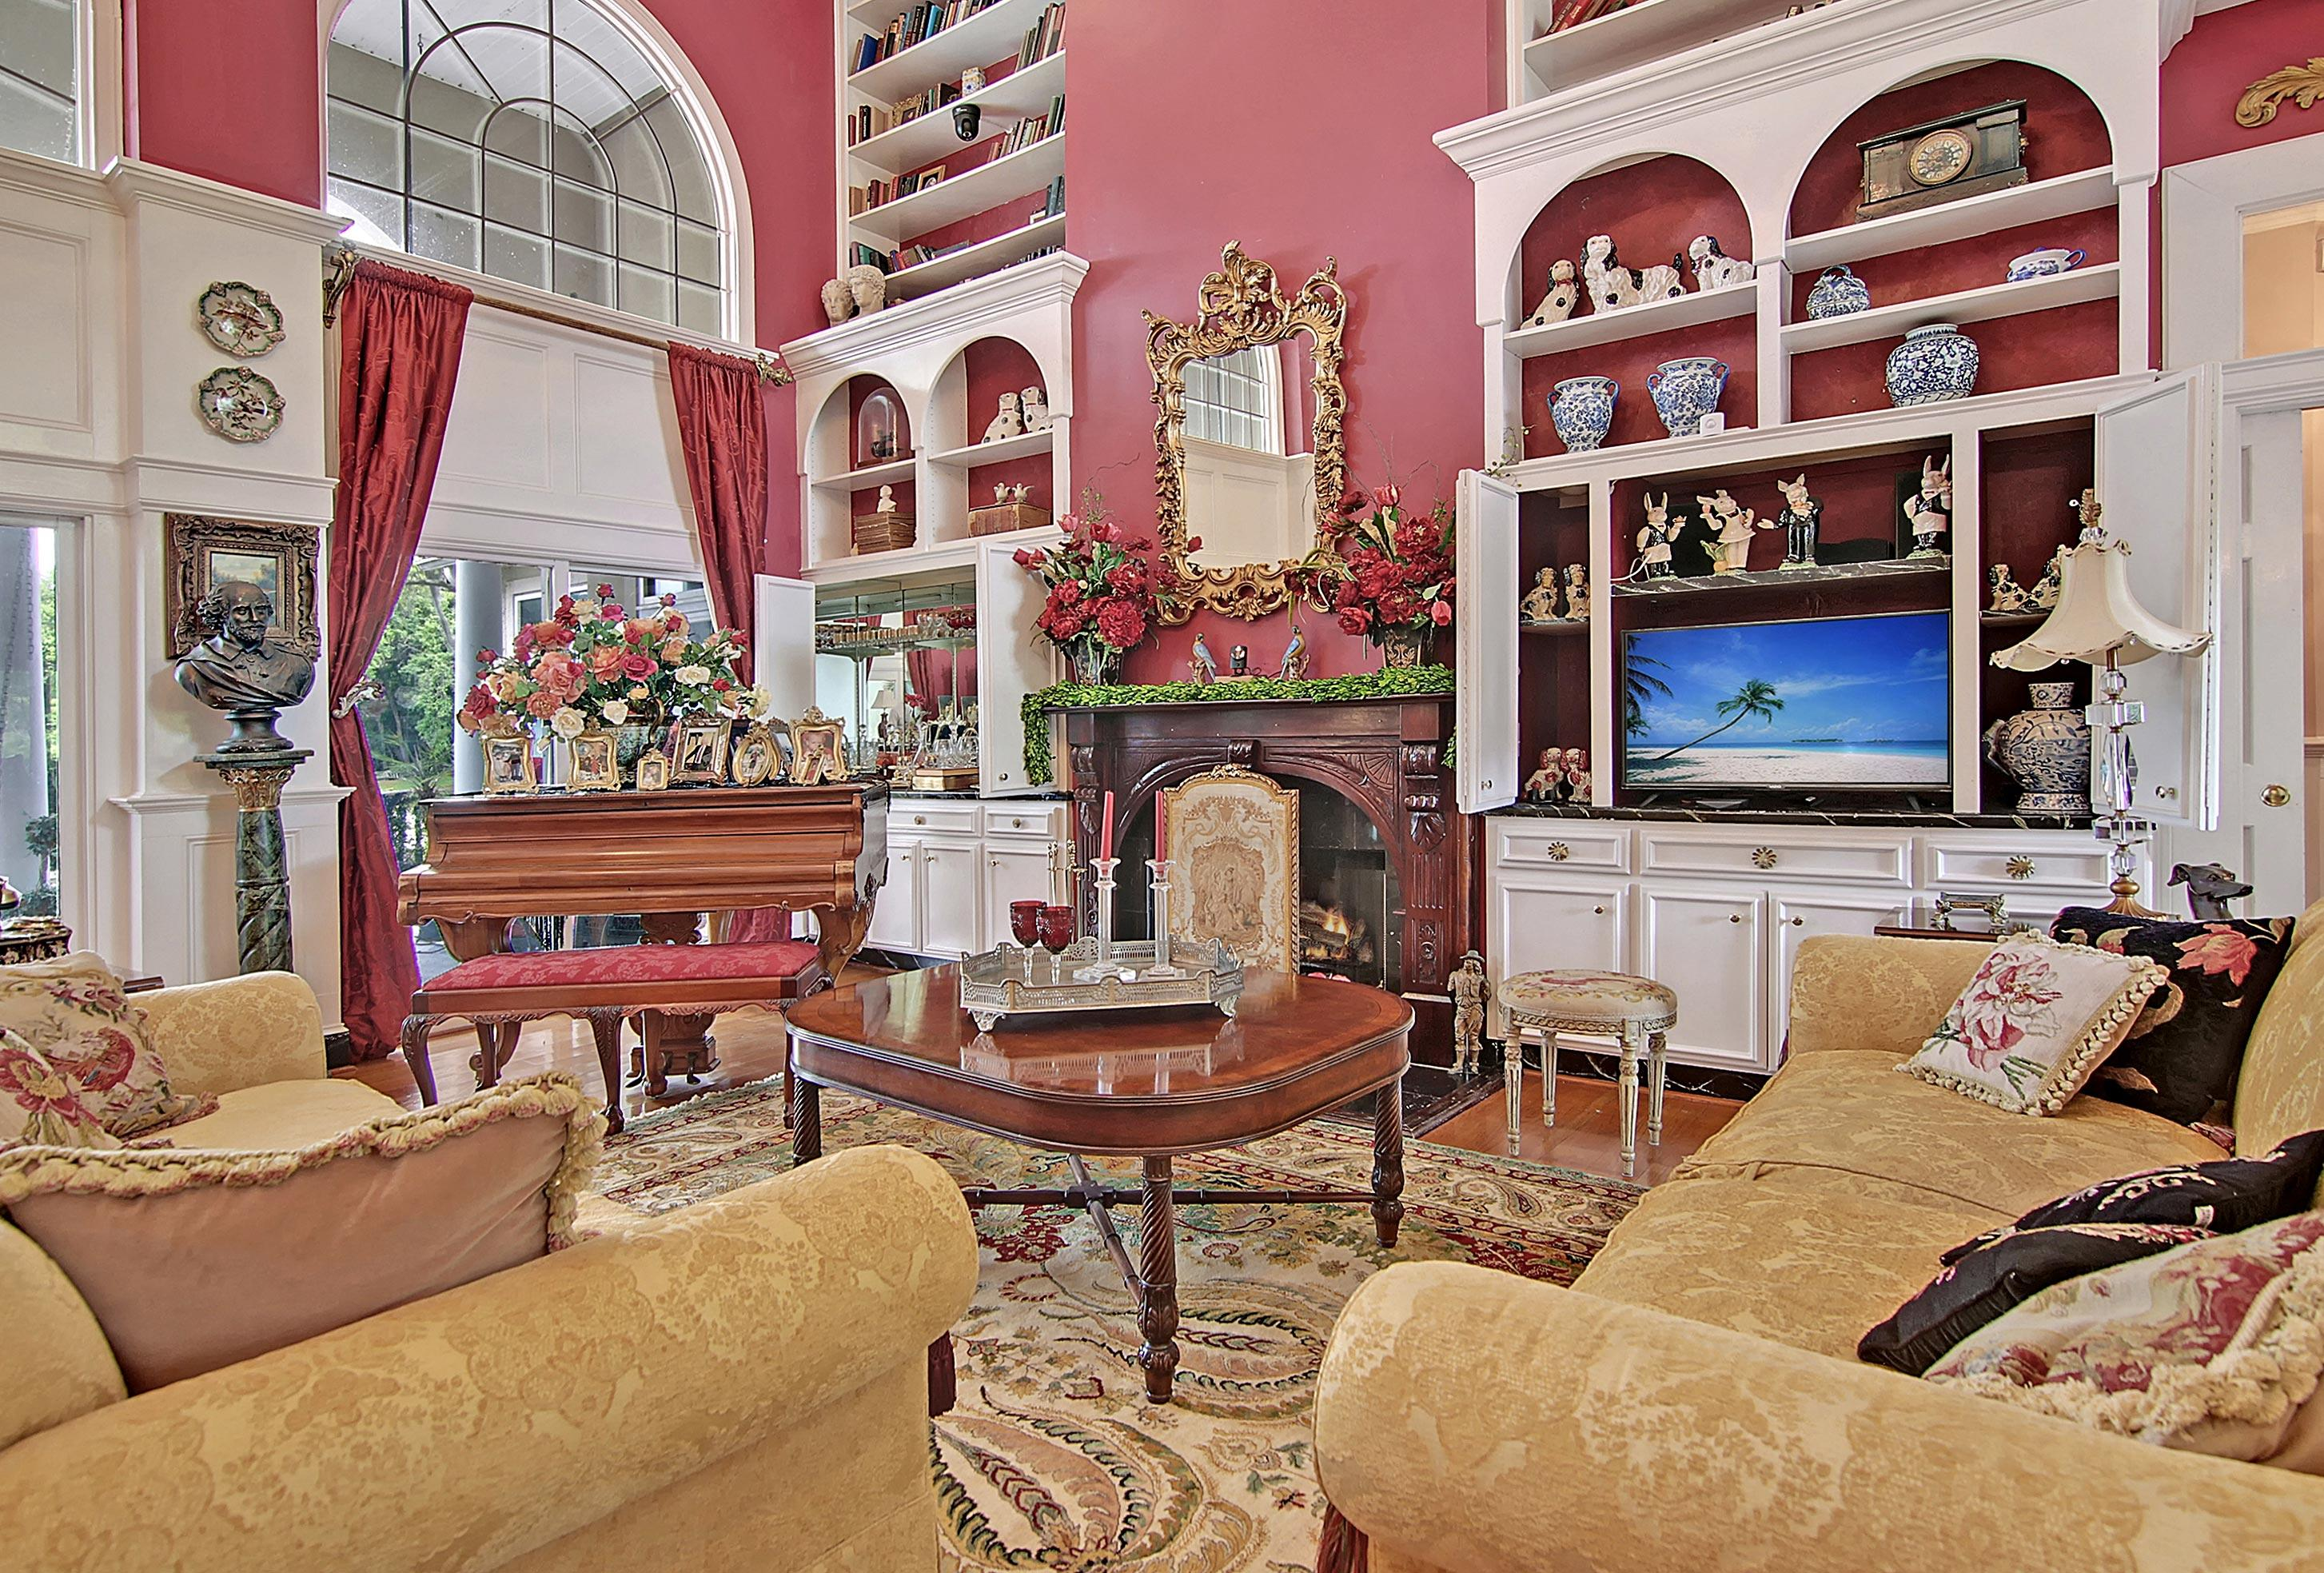 Edgewater Park Homes For Sale - 1323 Edgewater, Charleston, SC - 37